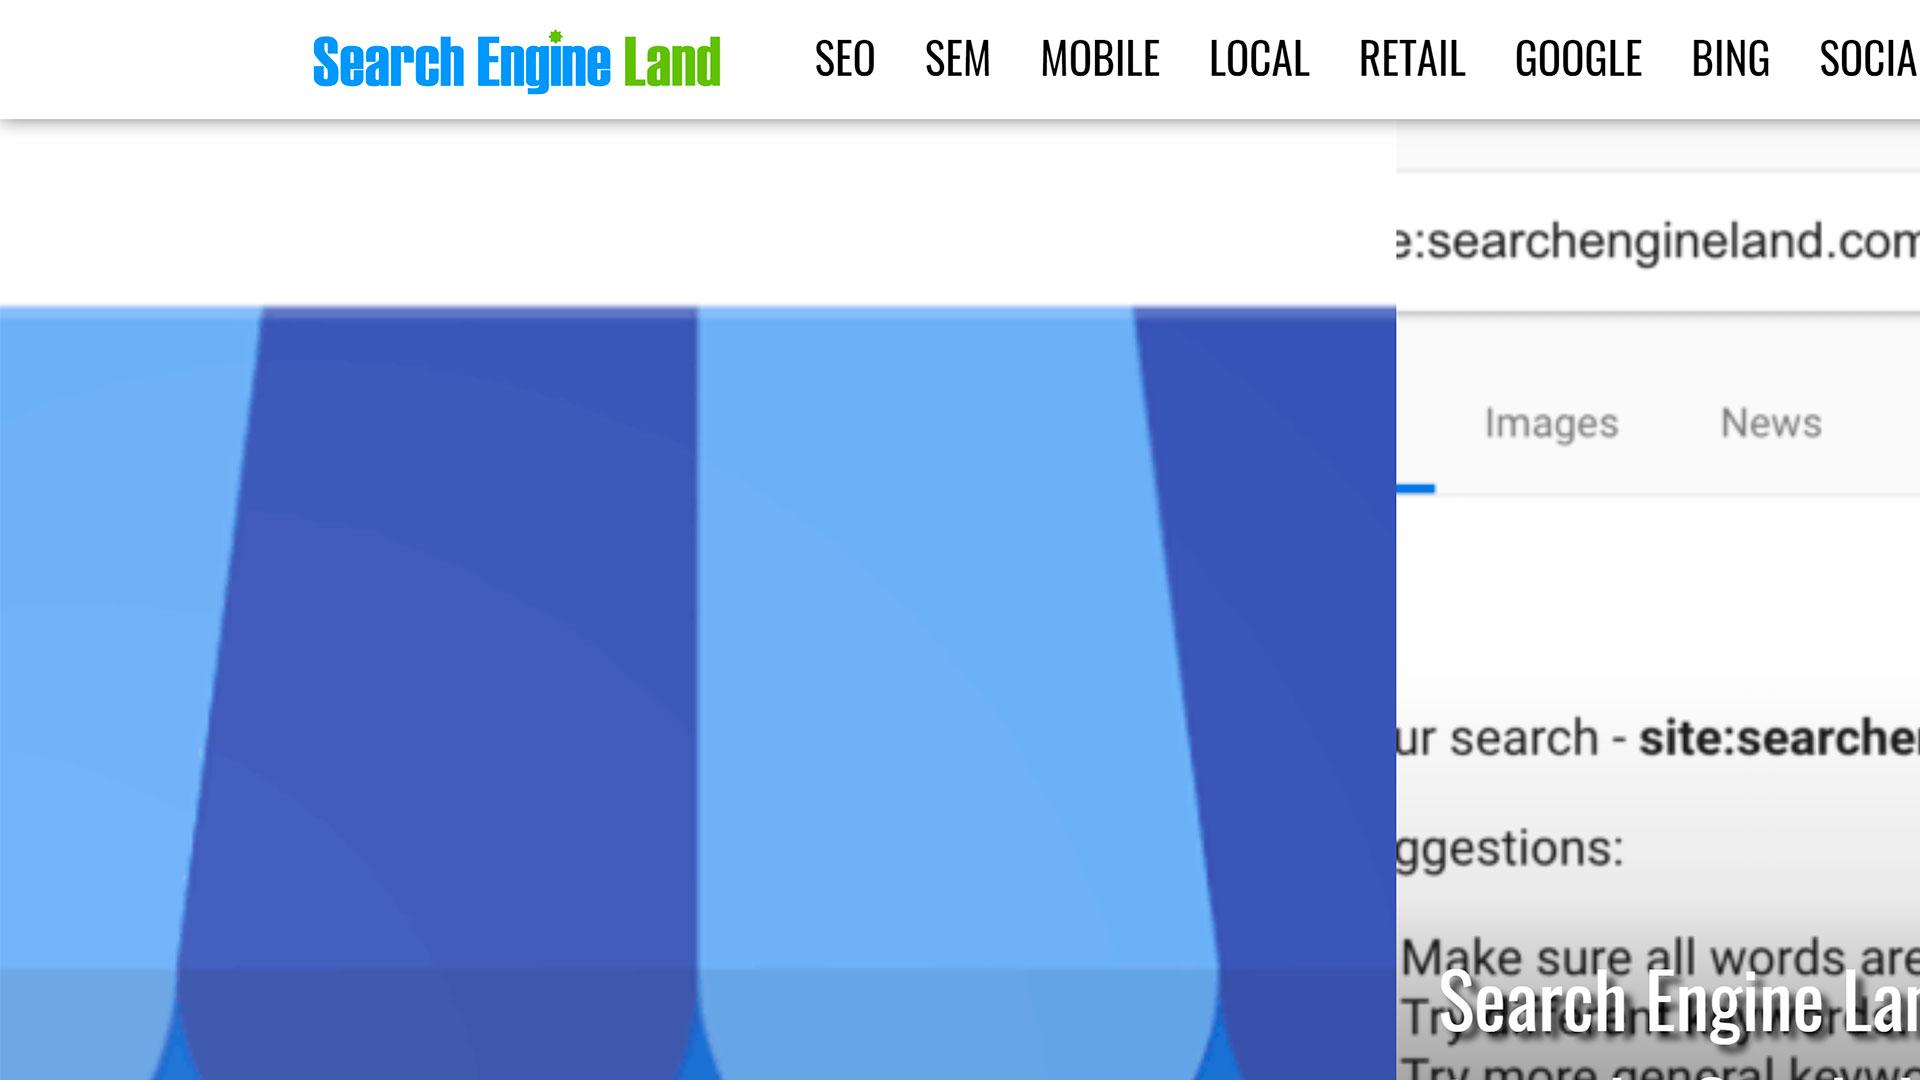 search engine land foi removido dos resultados de buscas do google